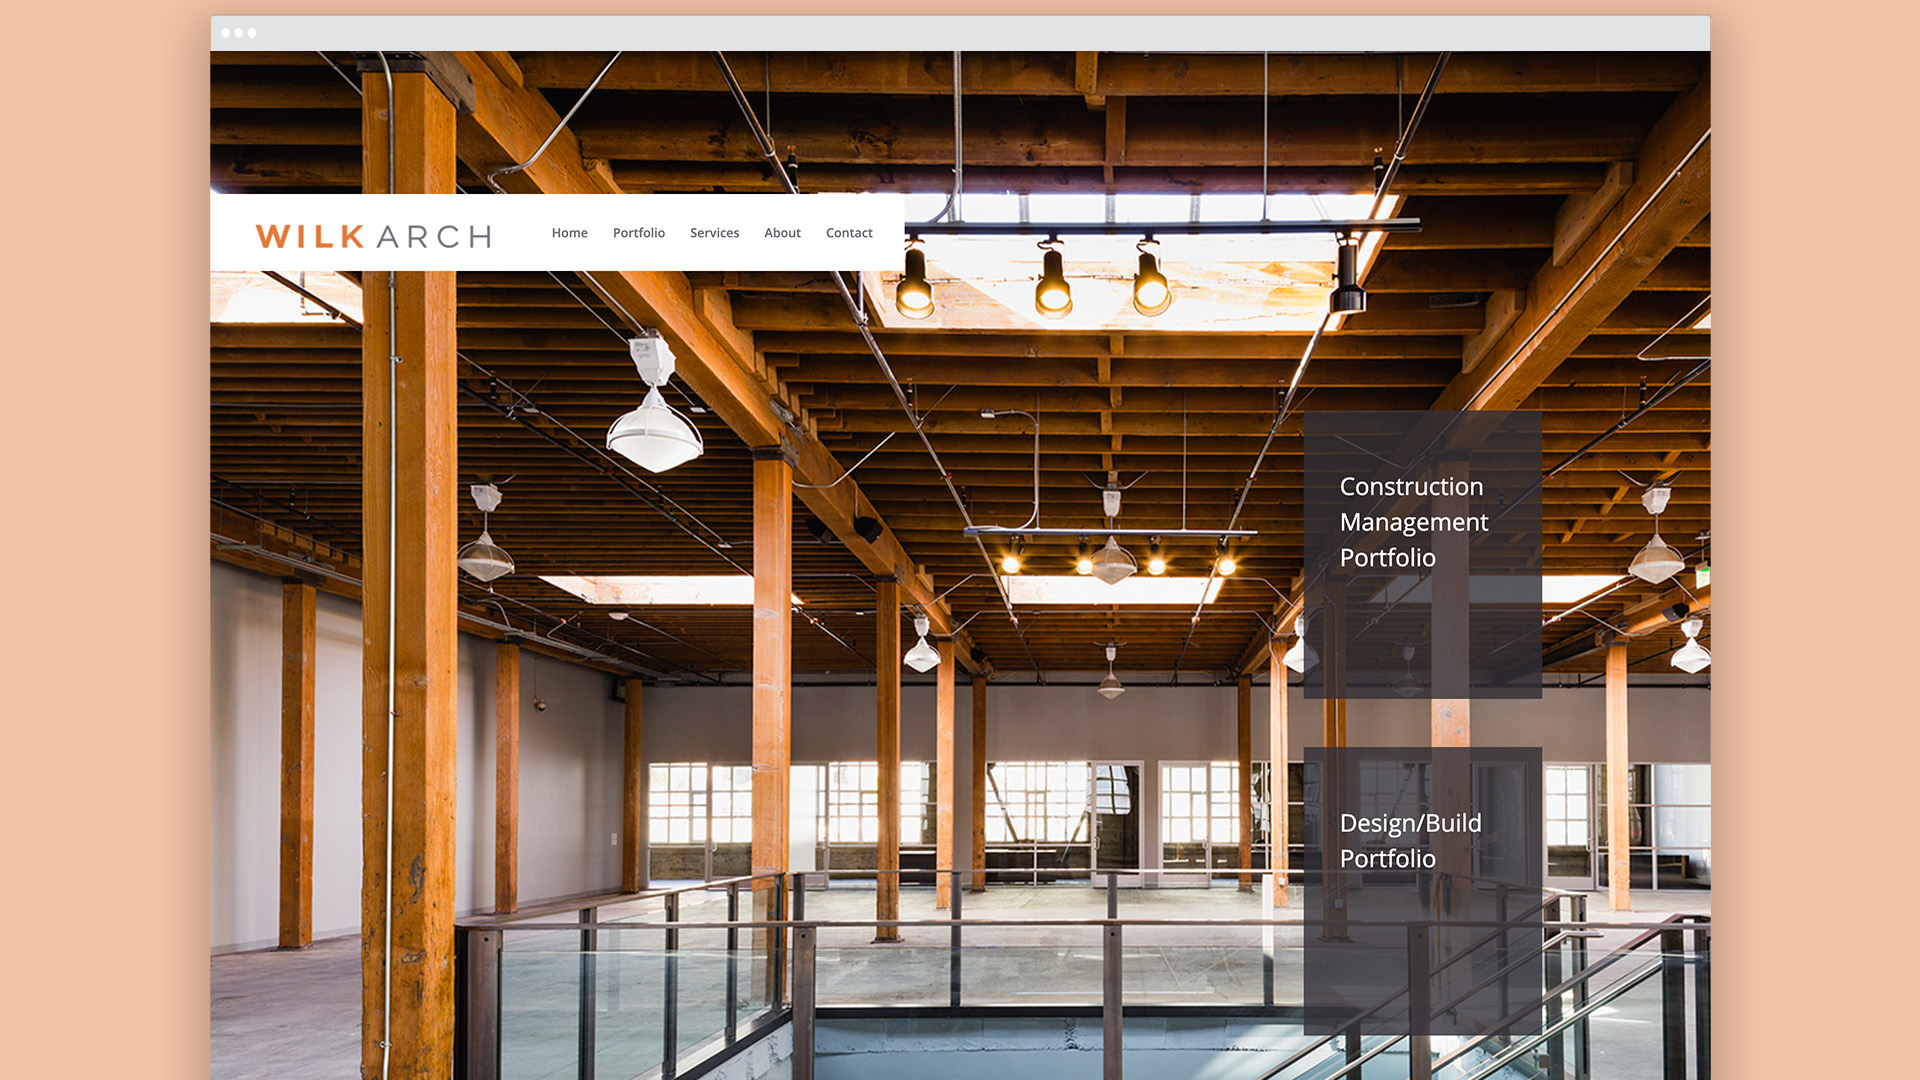 Architect, website design, logo design, branding, construction management